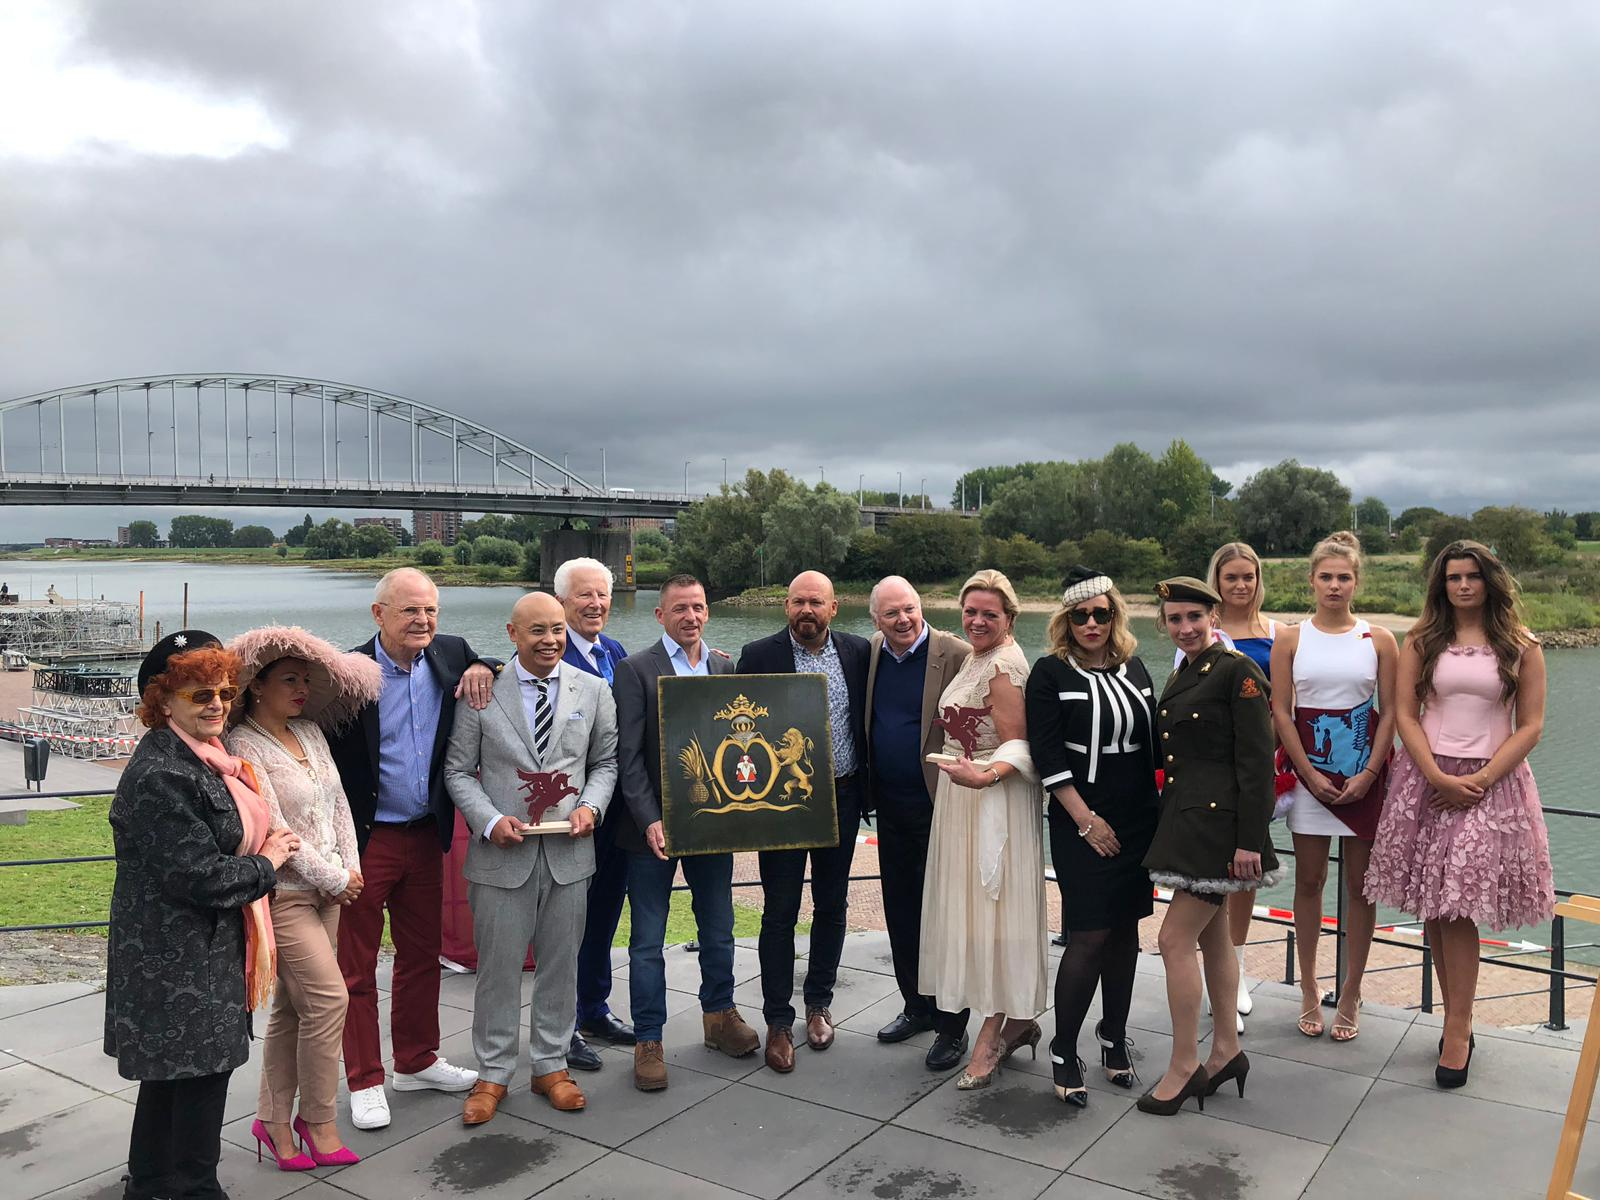 Stichting H.E.A.R.T ontvangt de Michiel de Ruyter prijs.